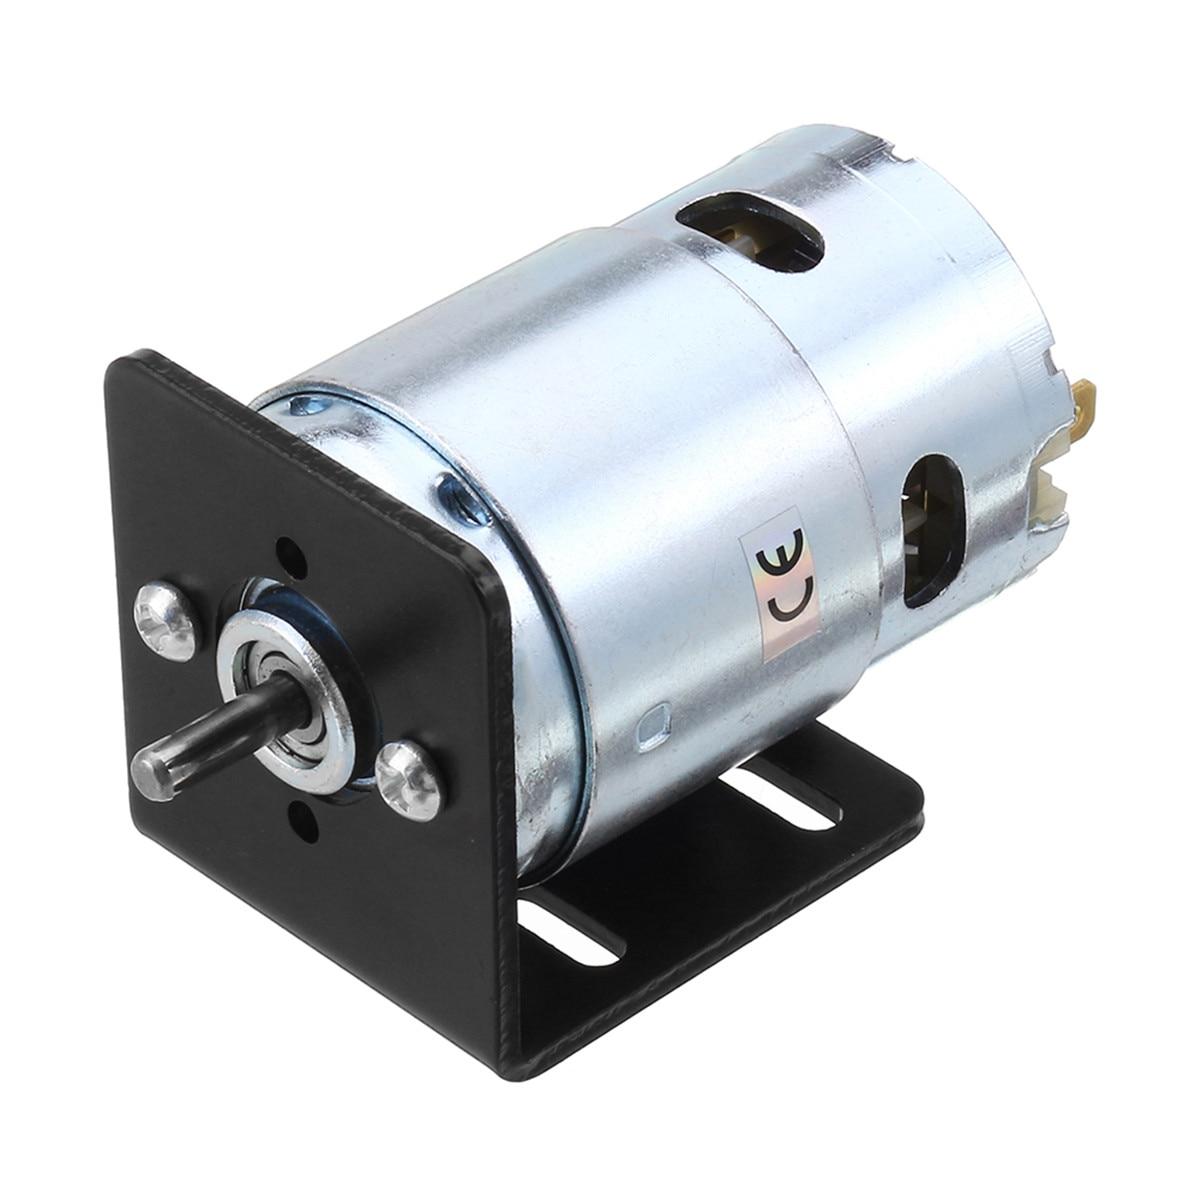 XNEMON 775 795 895 Motor Halterung/Getriebe Motor DC 12 V-24 V 3000-12000RPM Motor große Drehmoment Getriebe Motor